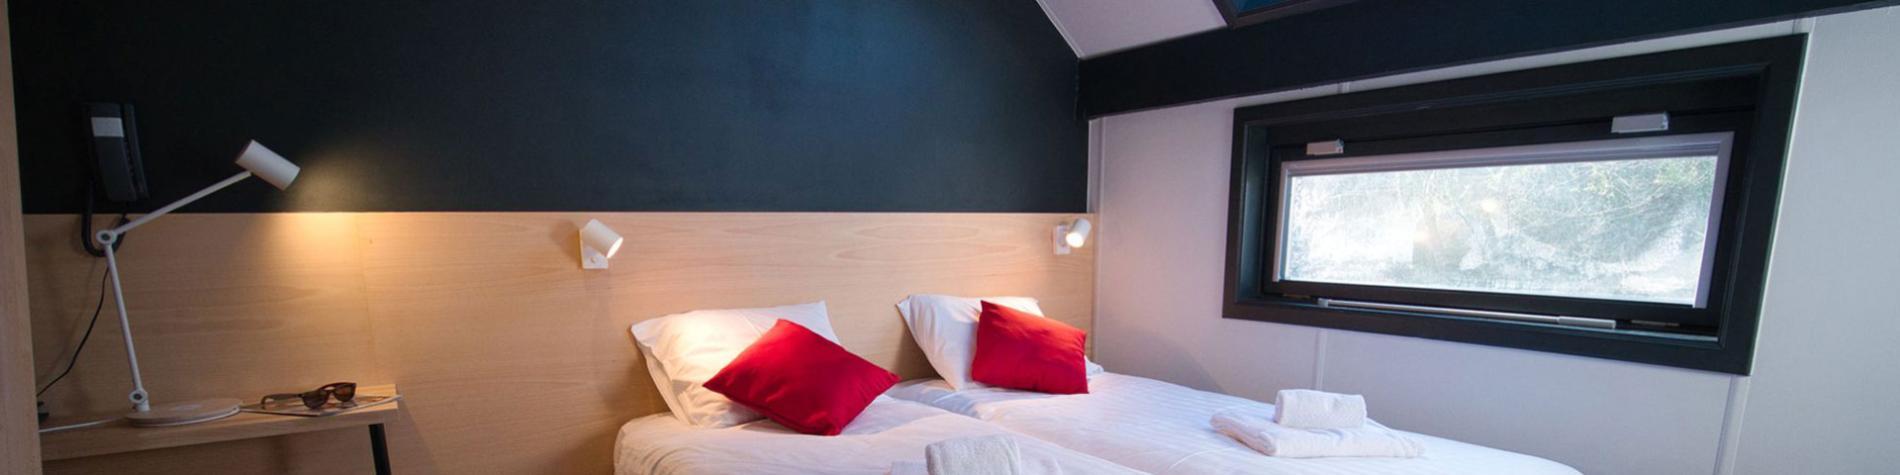 Hôtel - Aquatel - Anseremme